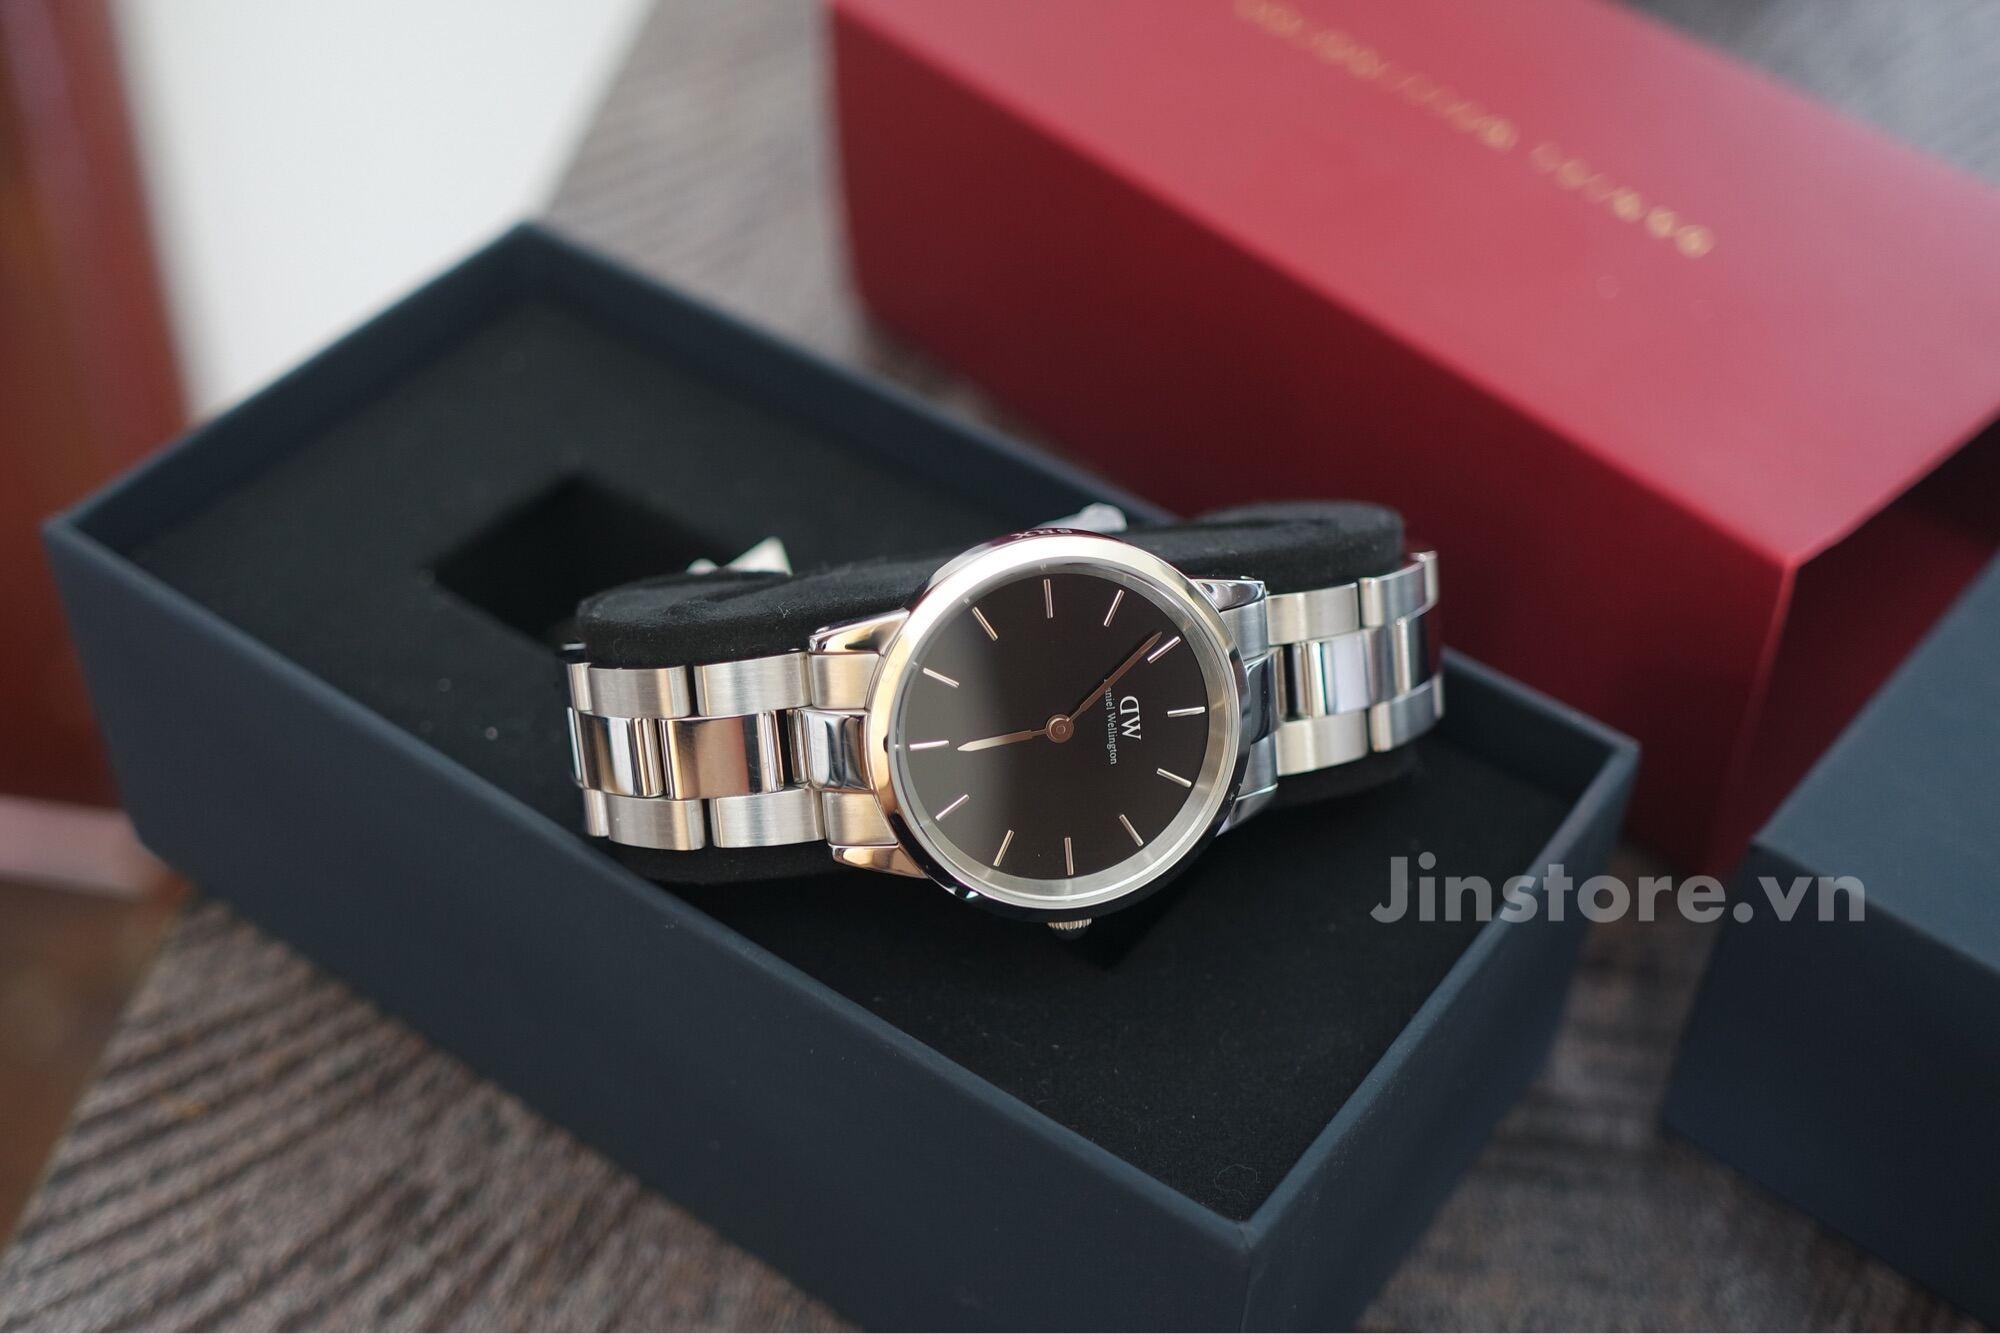 Đồng hồ nữ DW Iconic Link 32 Silver (Black) - DW00100206